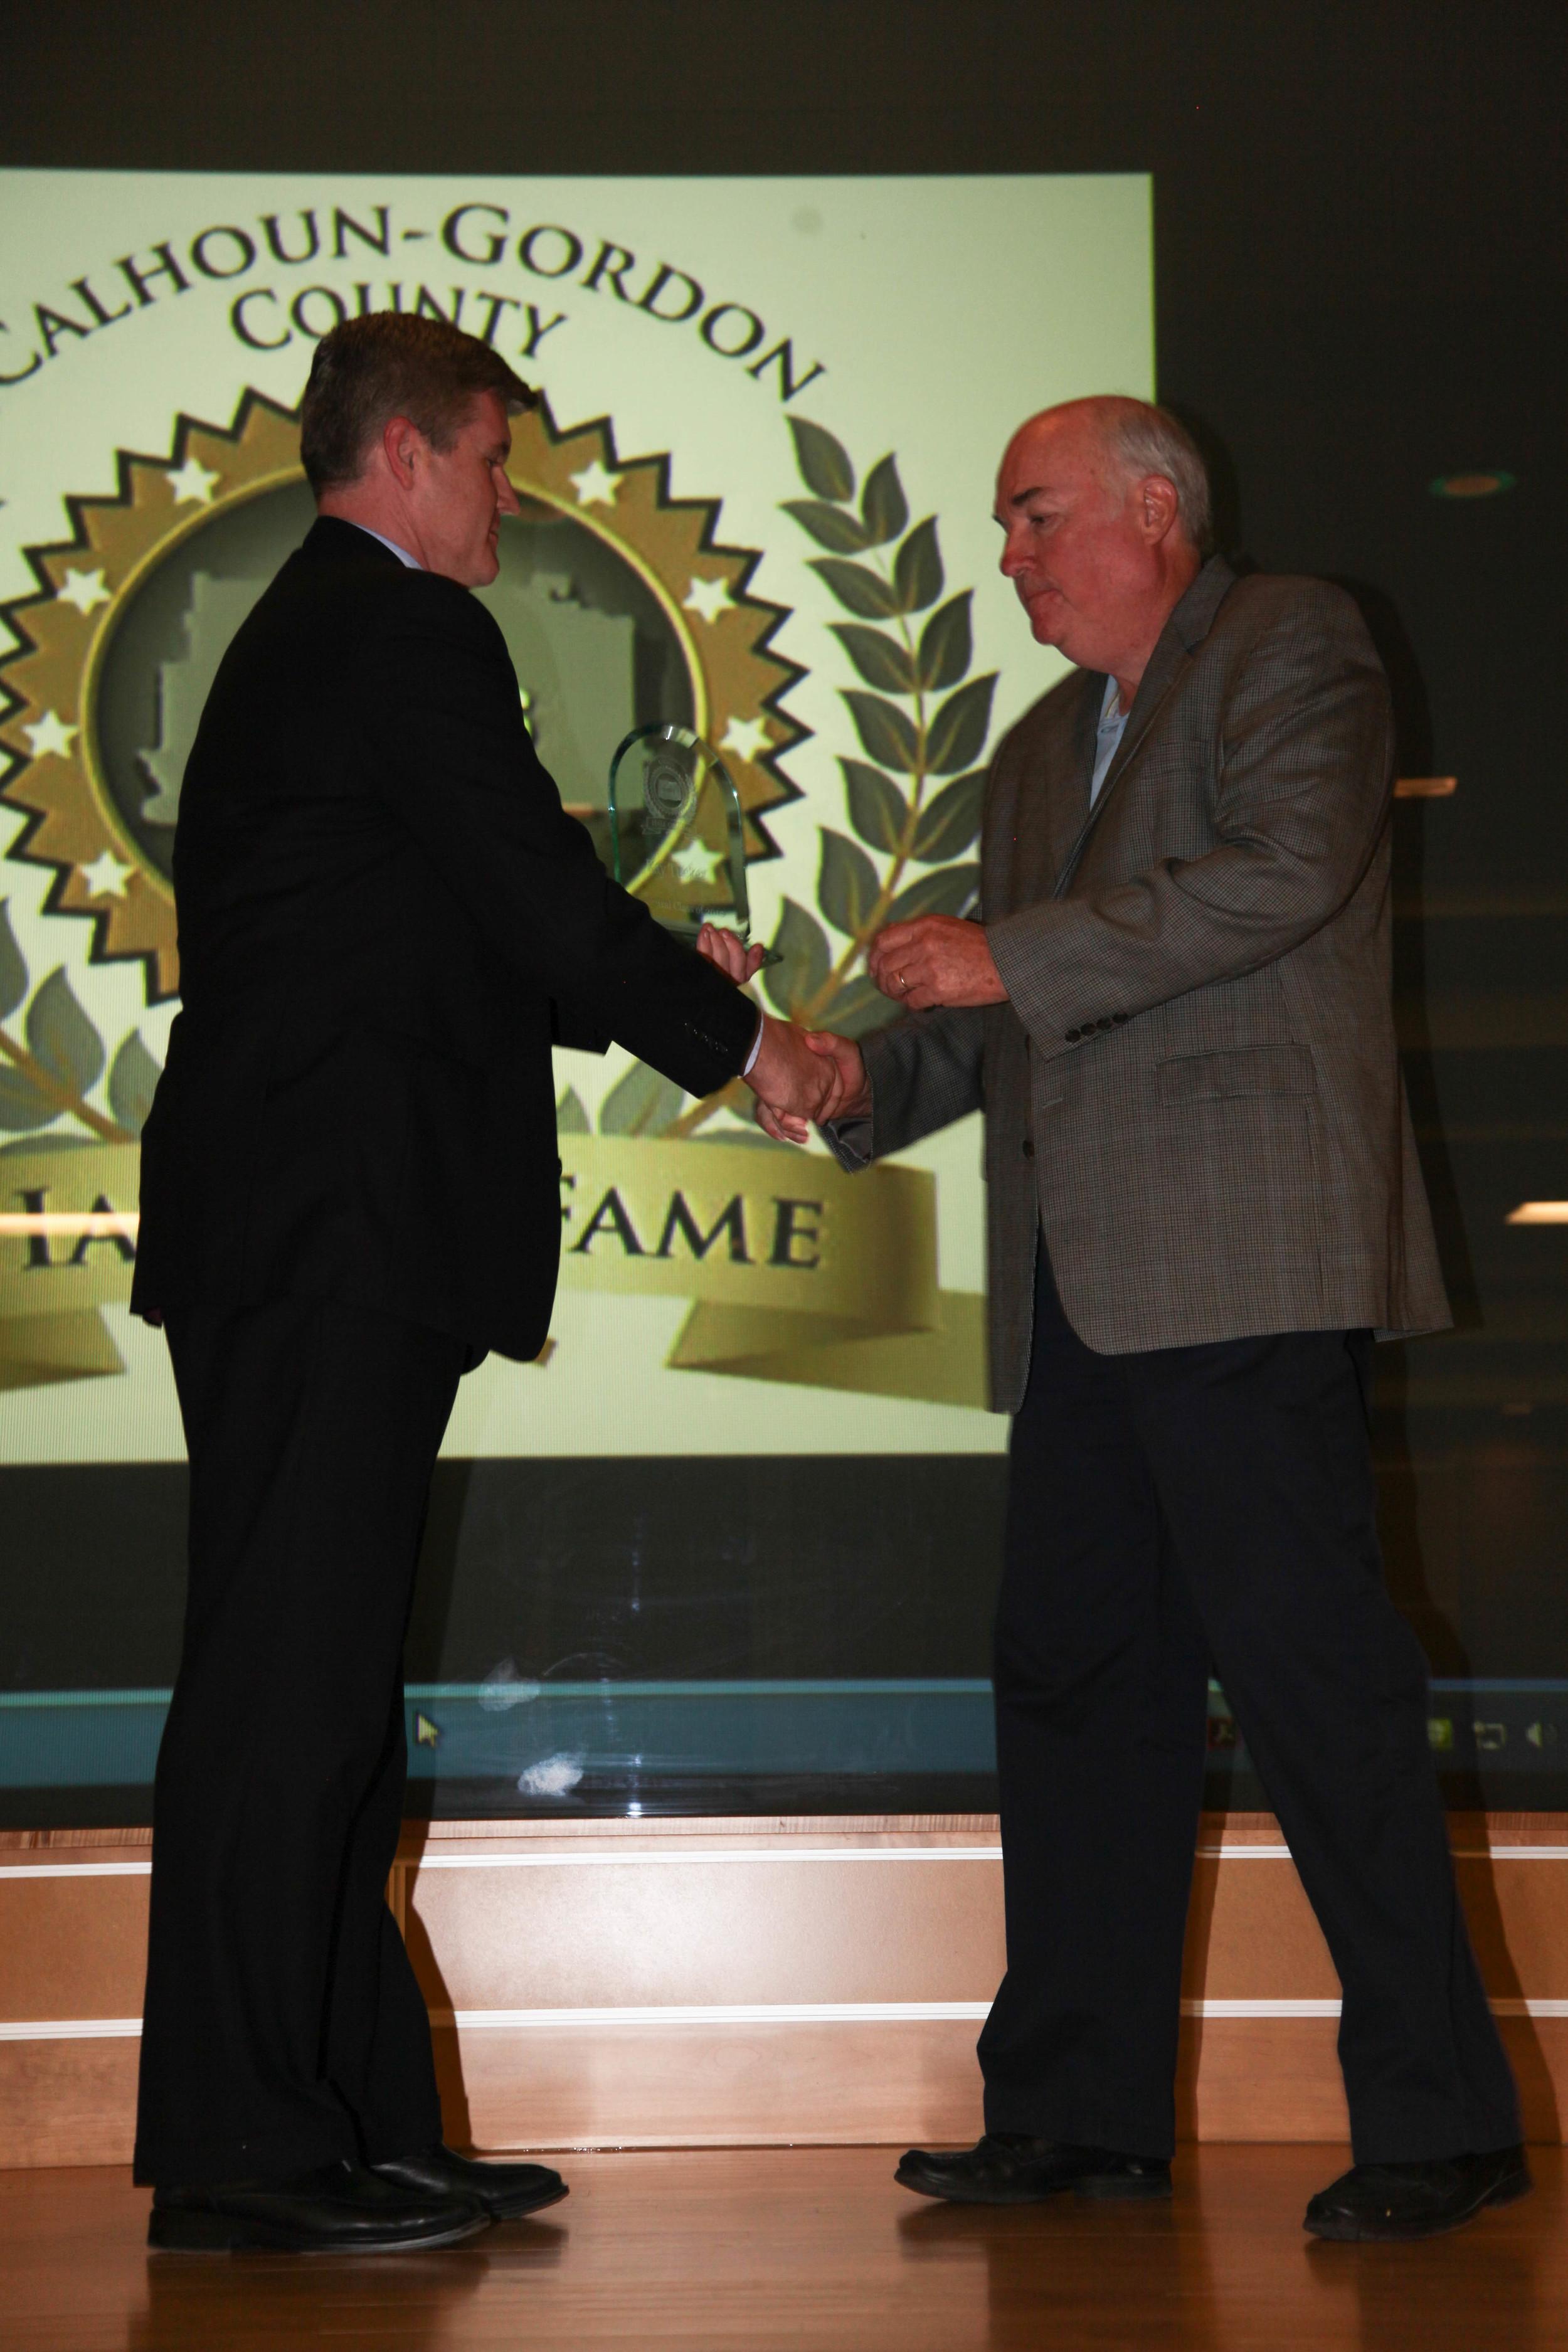 Calhoun-Gordon-County-Sports-Hall-of-Fame-2015-146.jpg